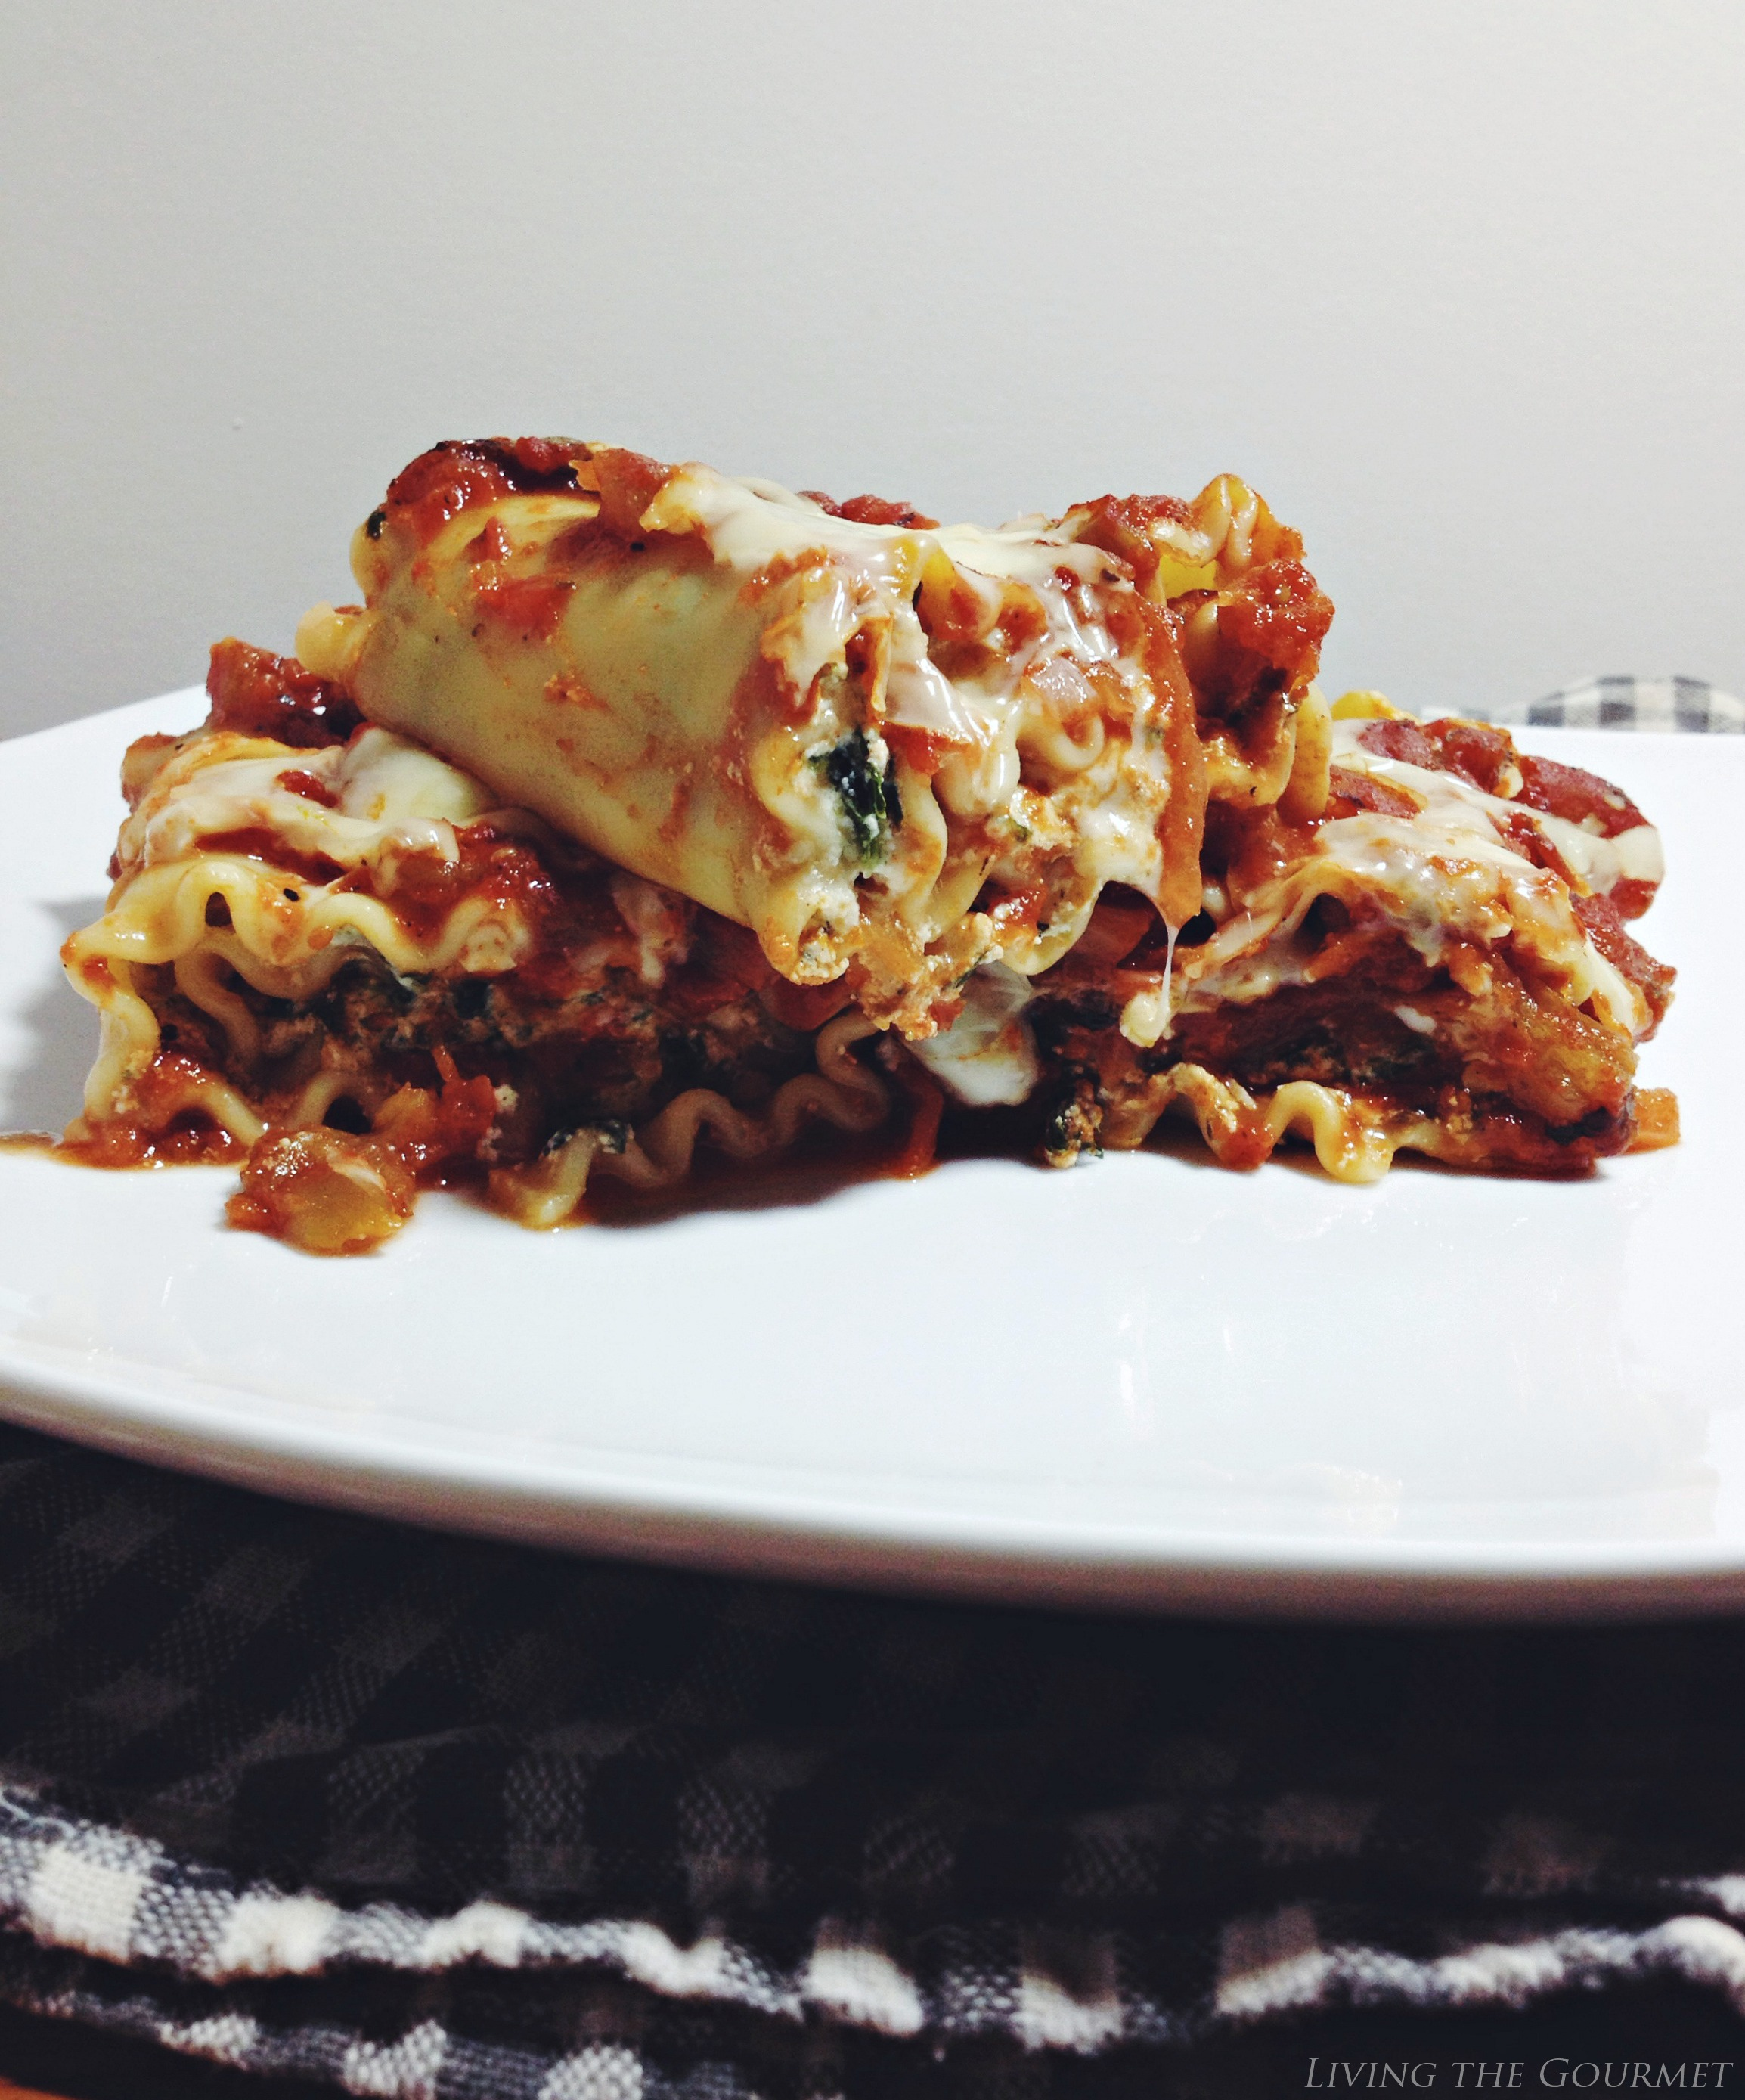 Living the Gourmet: Sweet Lasagna Roll-Ups